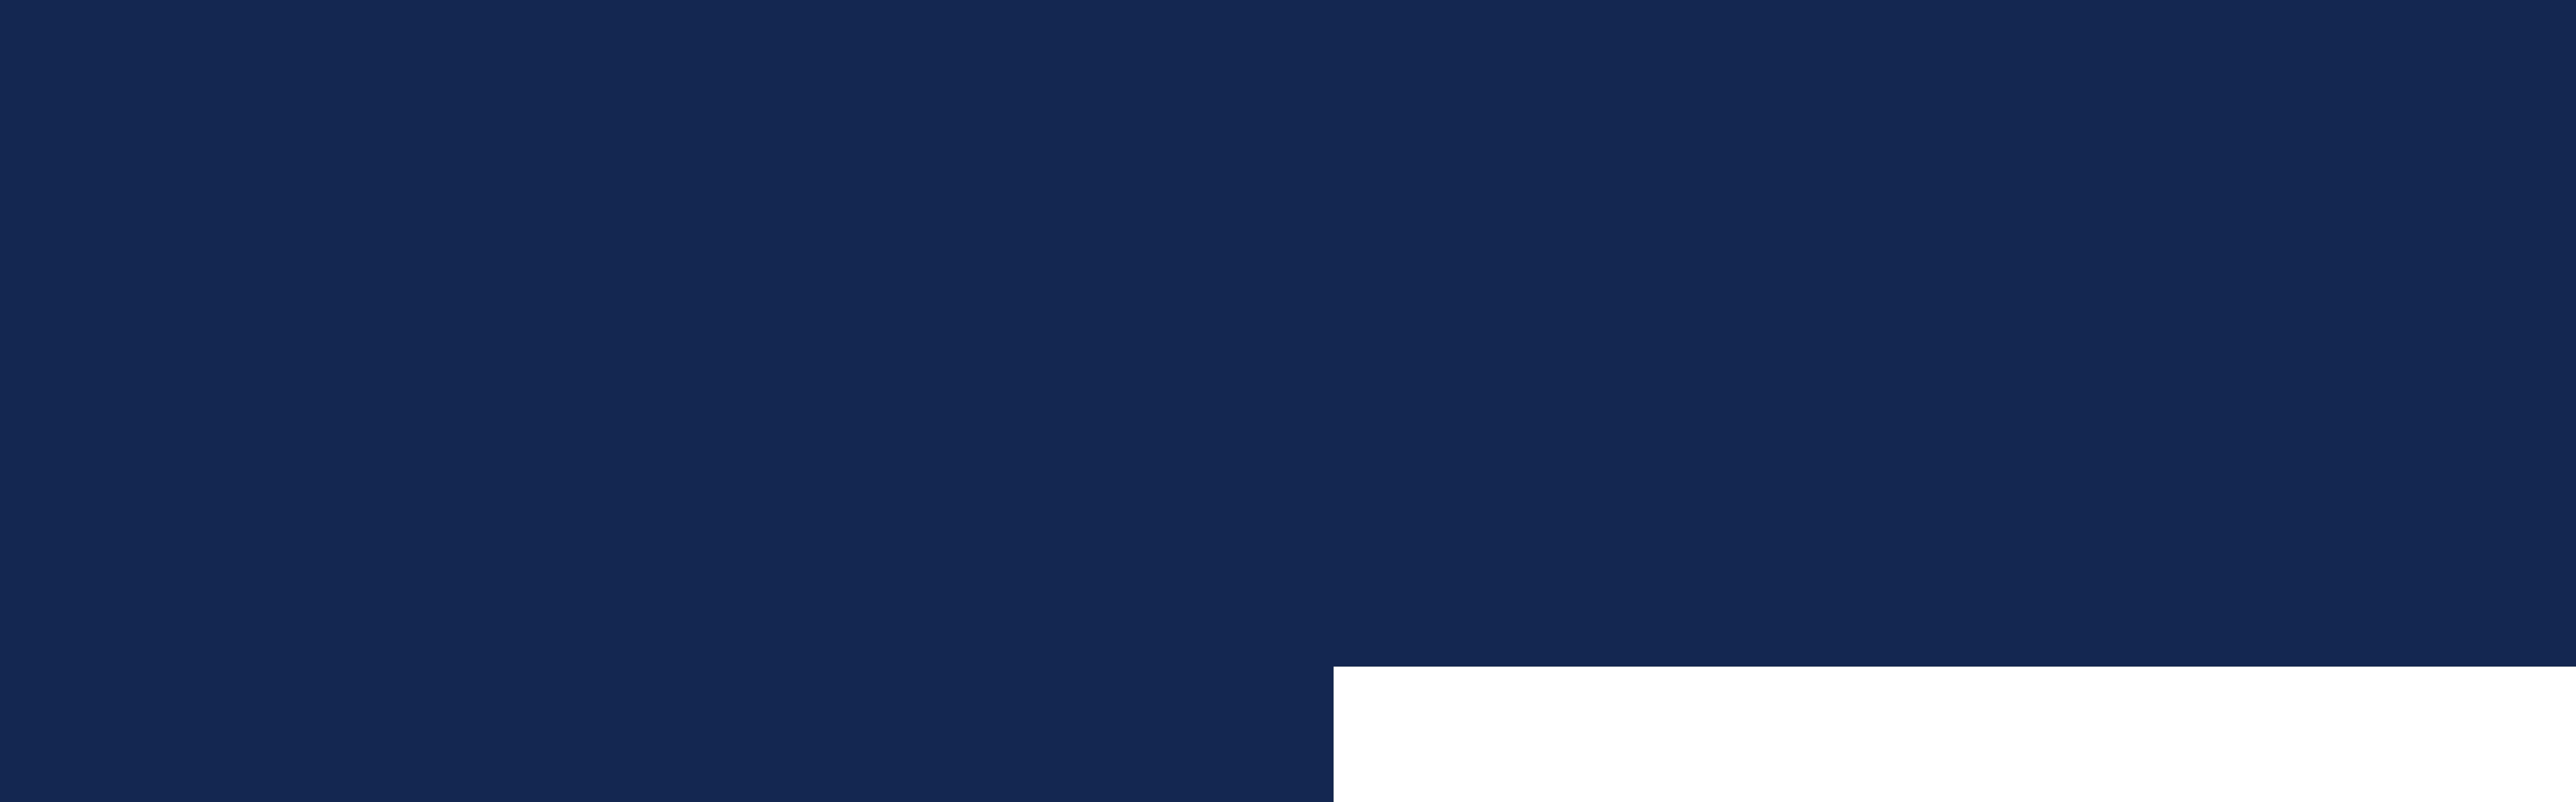 Logo de l'hôpital privé Confluent